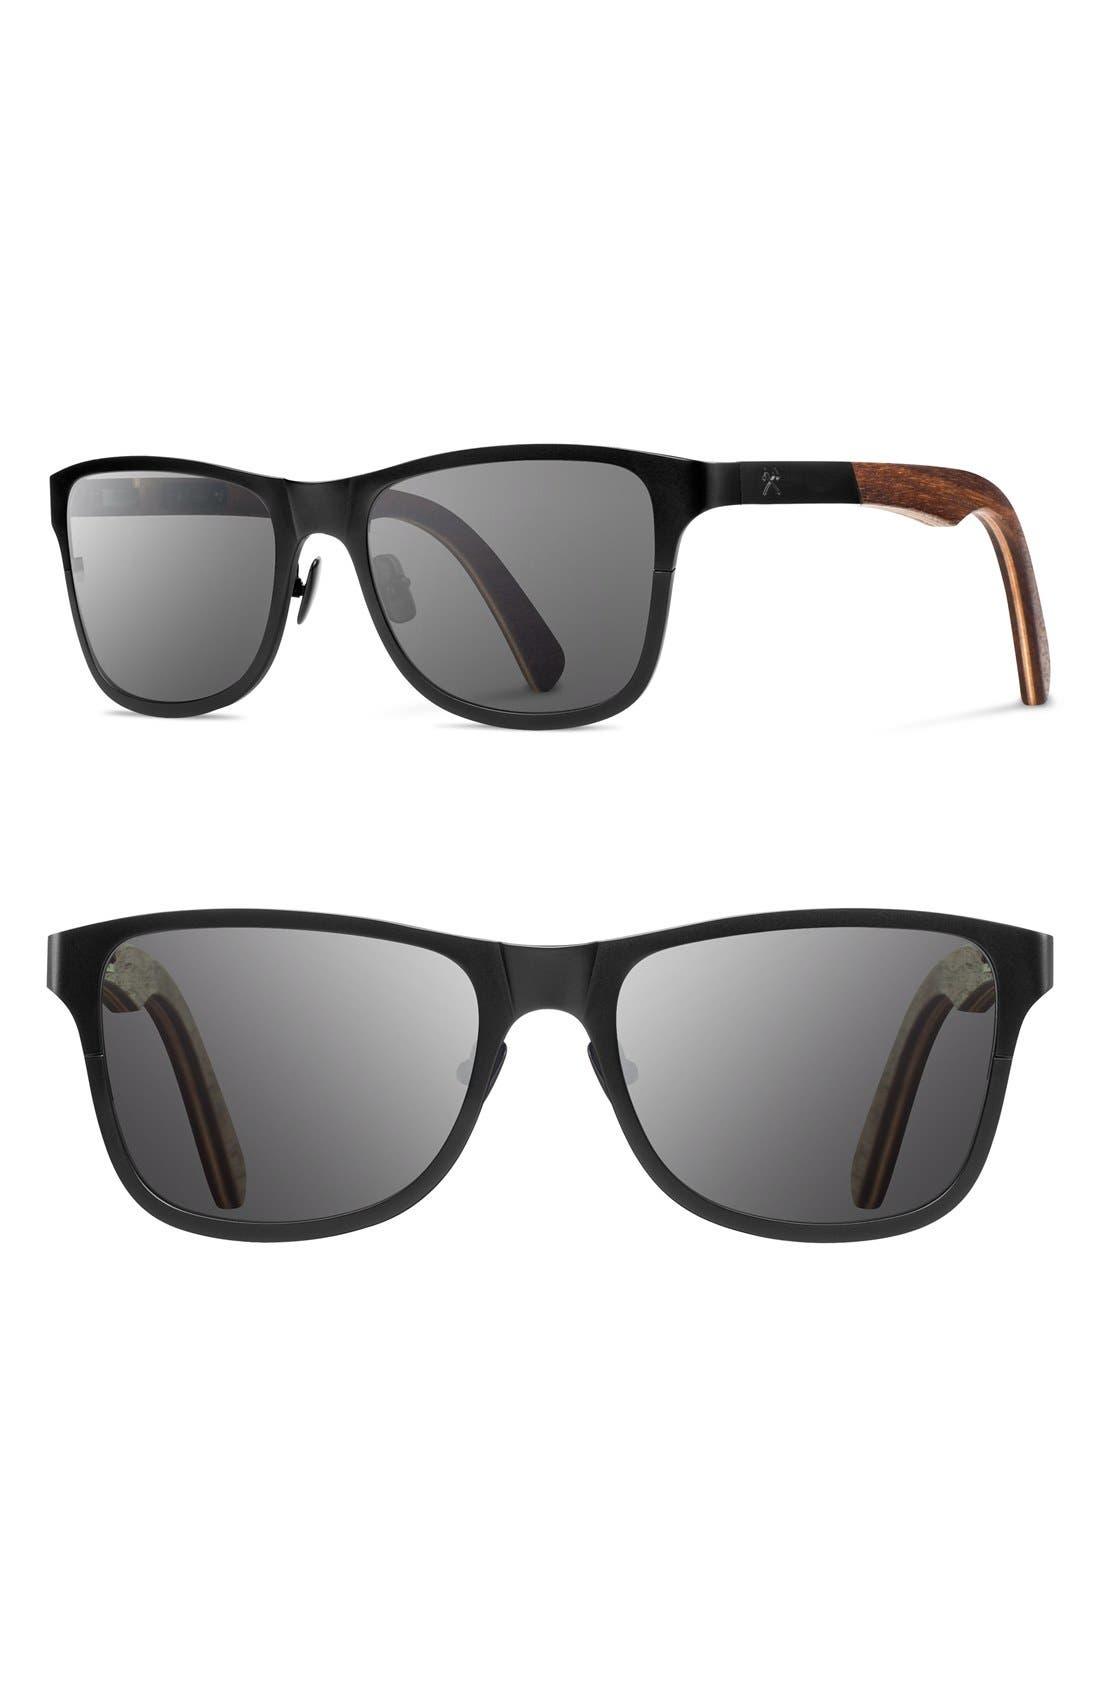 Alternate Image 1 Selected - Shwood 'Canby' 54mm Titanium & Wood Sunglasses